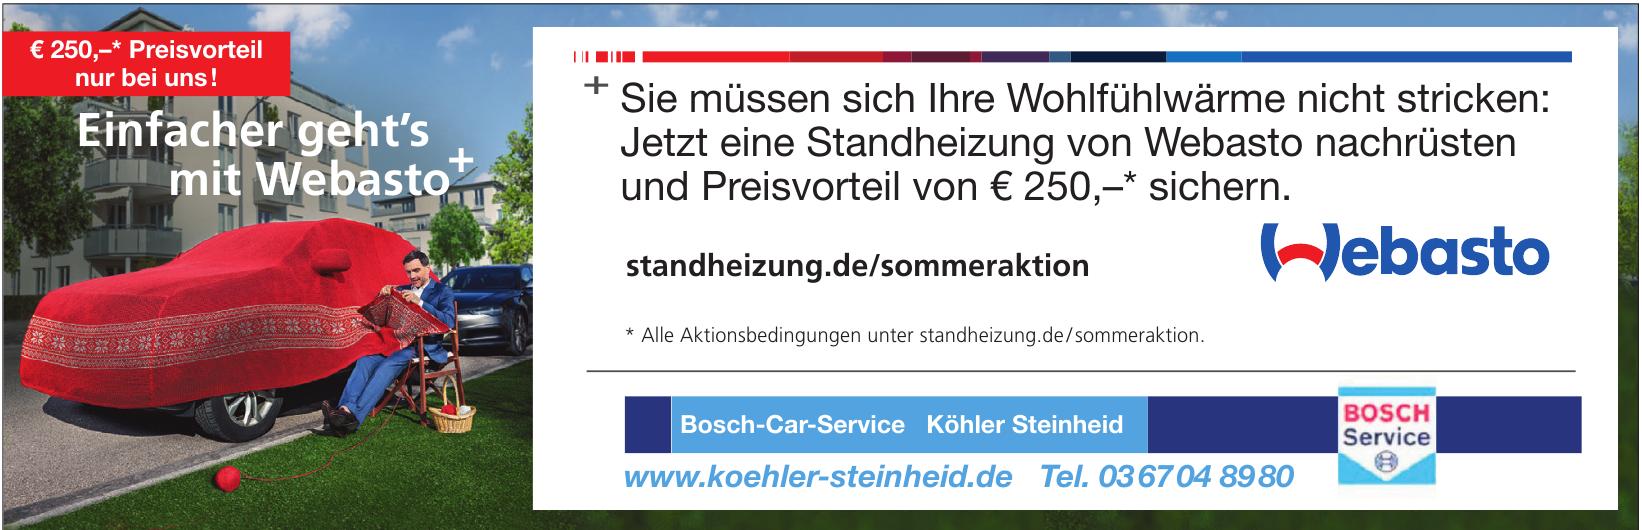 Bosch-Car-Service Köhler Steinheid